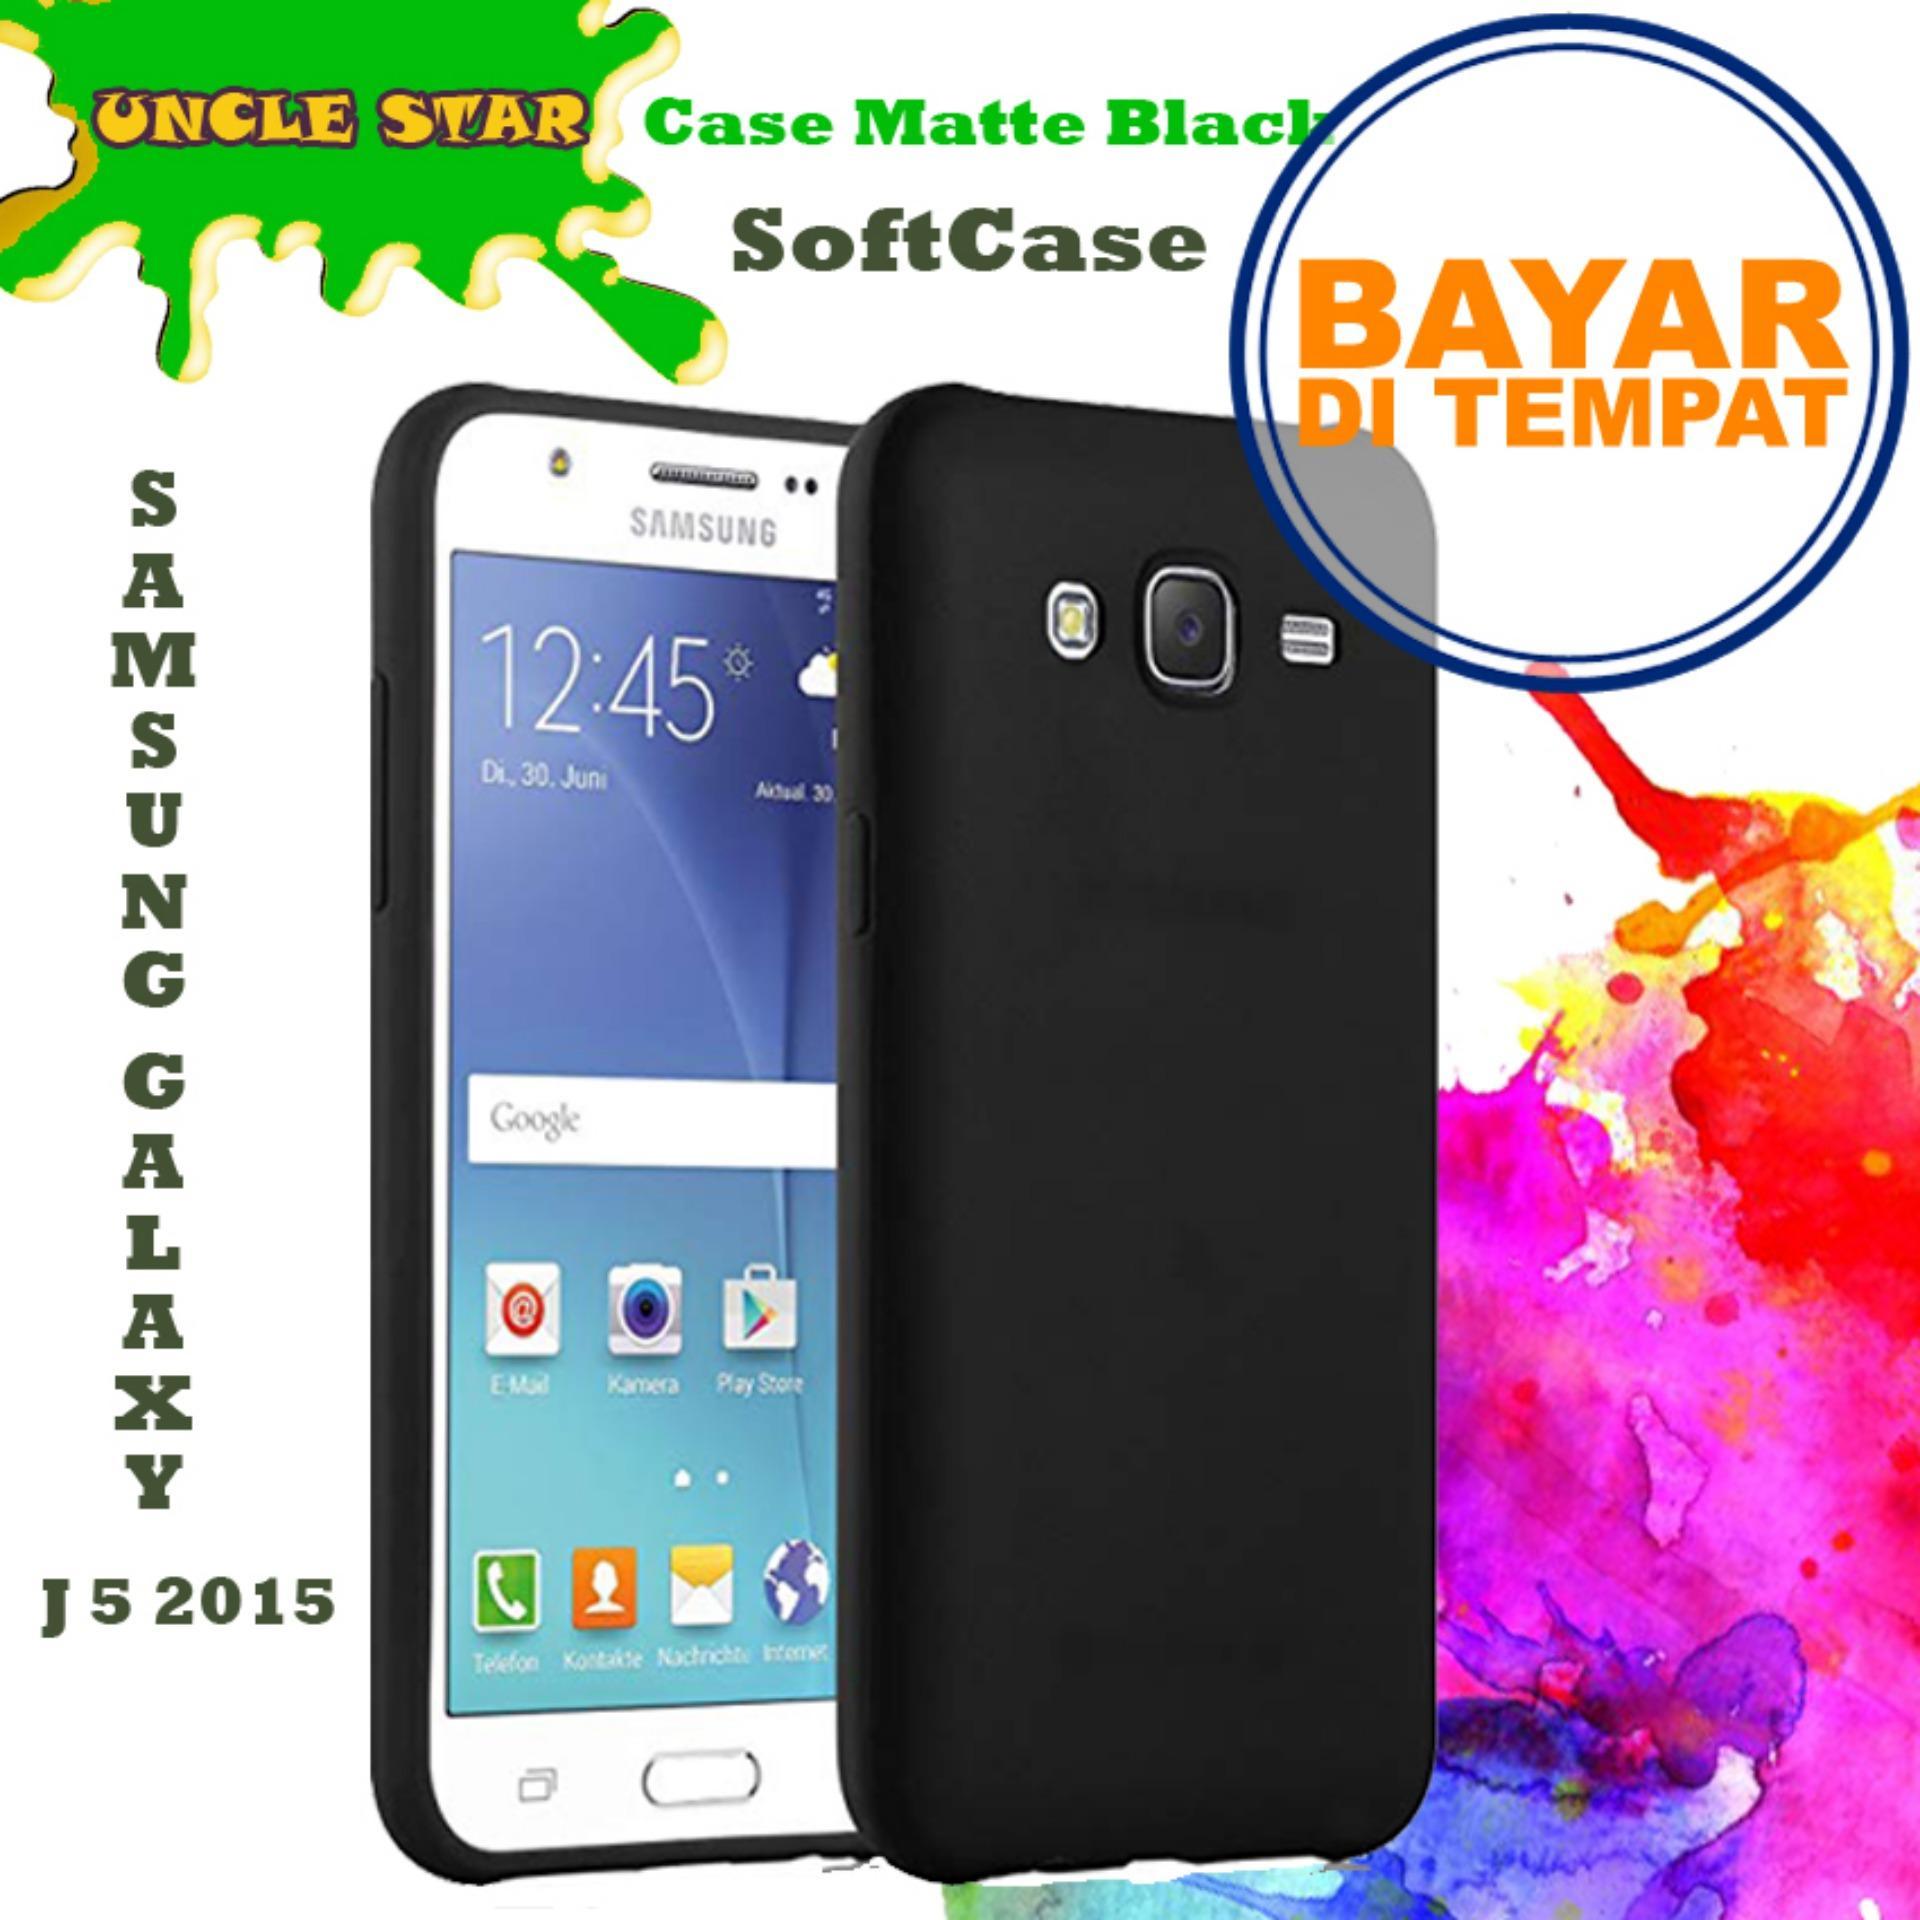 Harga Jual Samsung Galaxy J1 Ace 2016 Sm J111 8gb Hitam Rp Uncle Star Softcase Case Matte Black Elegant For J5 2015